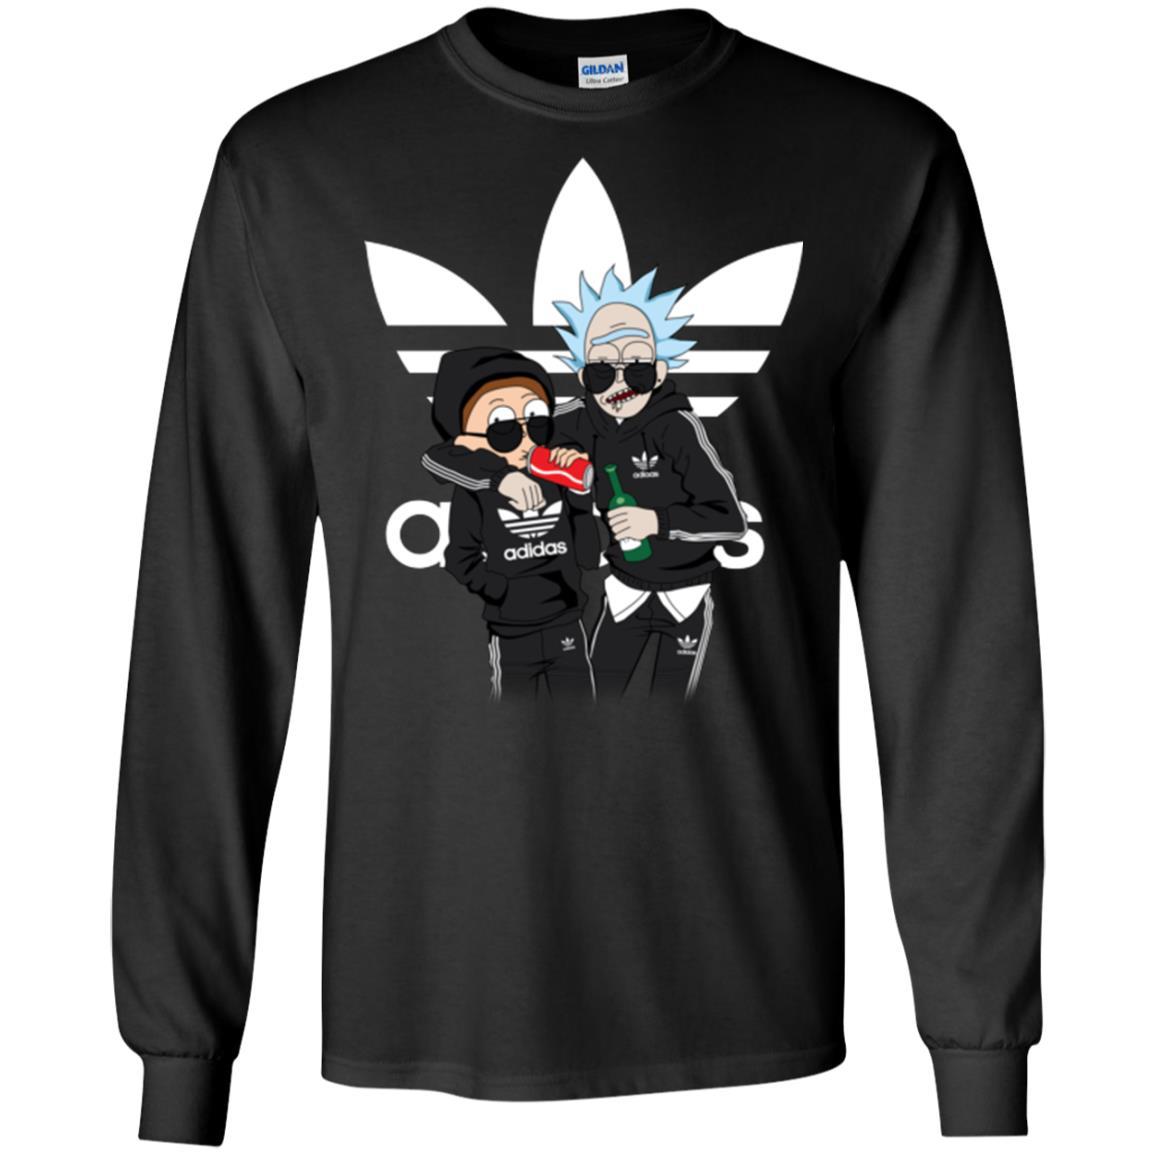 image 288px Rick and Morty Adidas Mashup T Shirt, Hoodies, Tank Top